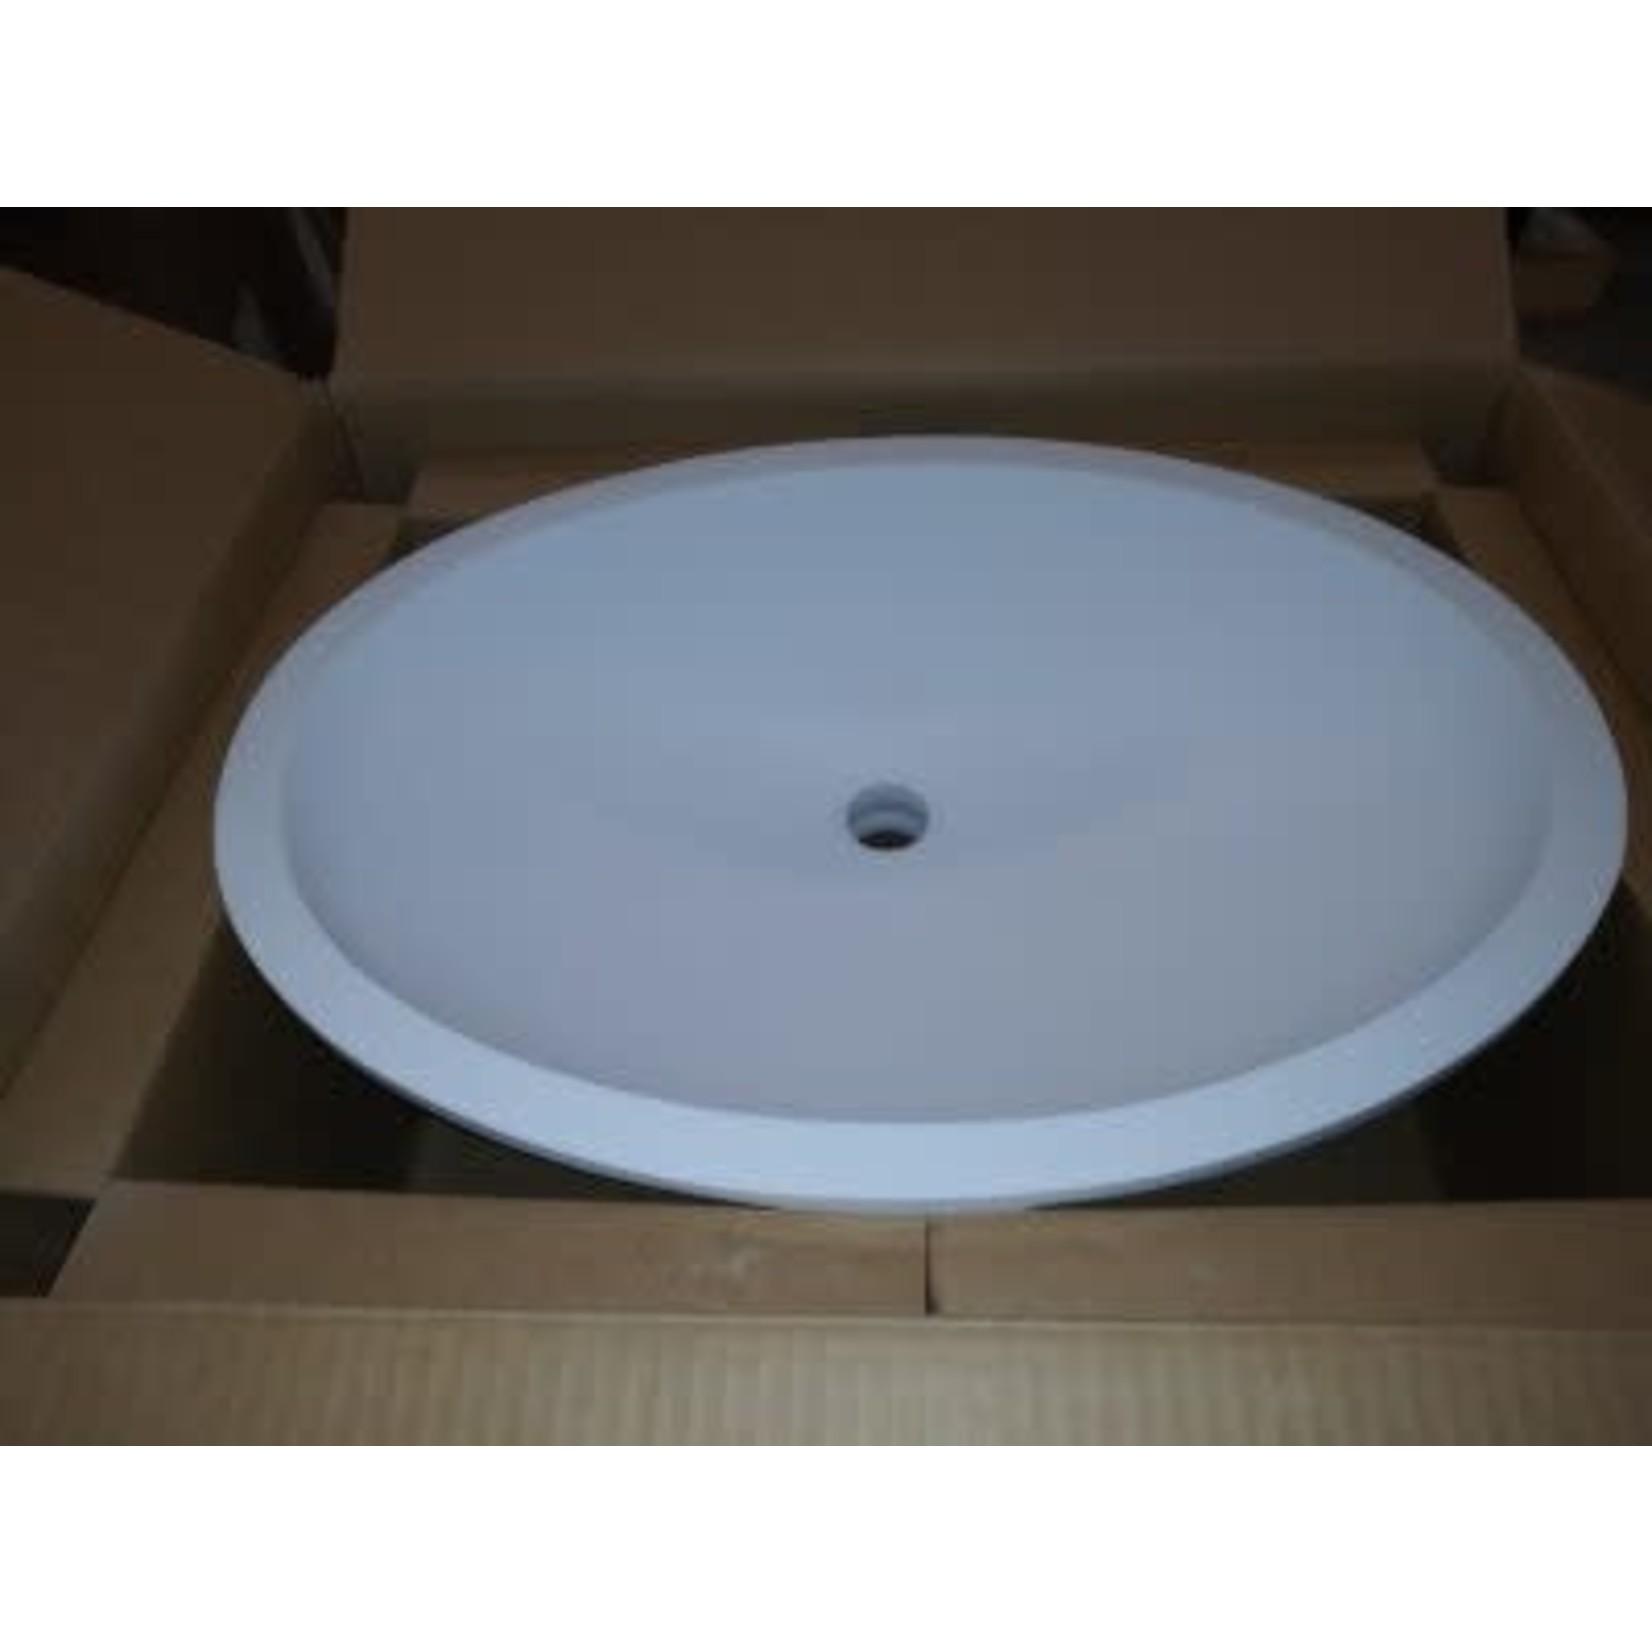 2815 Wilsonart Designer White Large Oval Vanity Sink